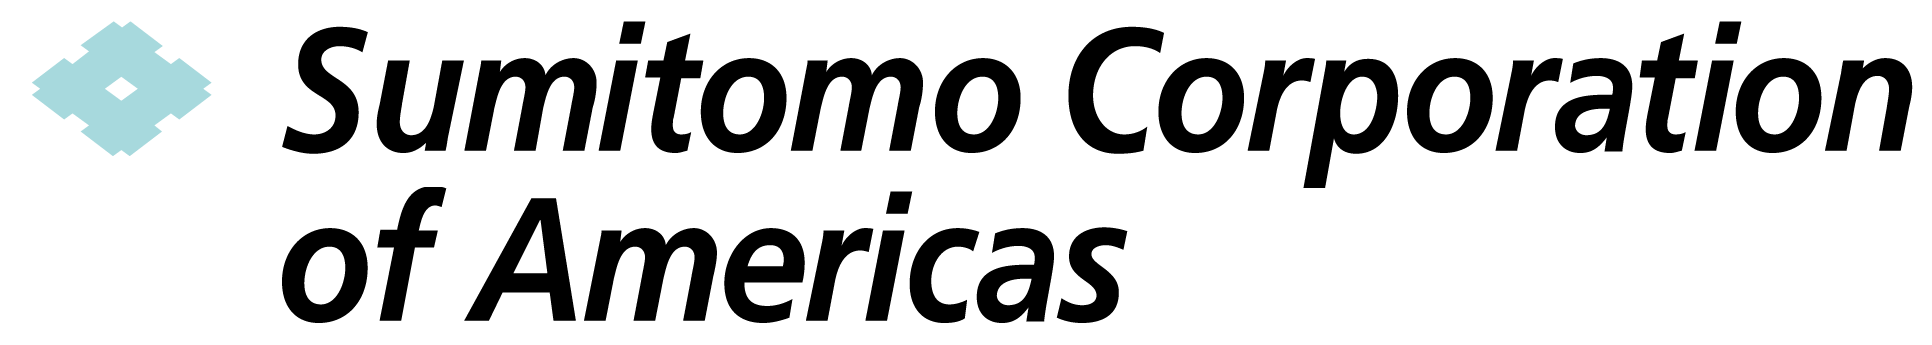 Sumitomo corporation logo